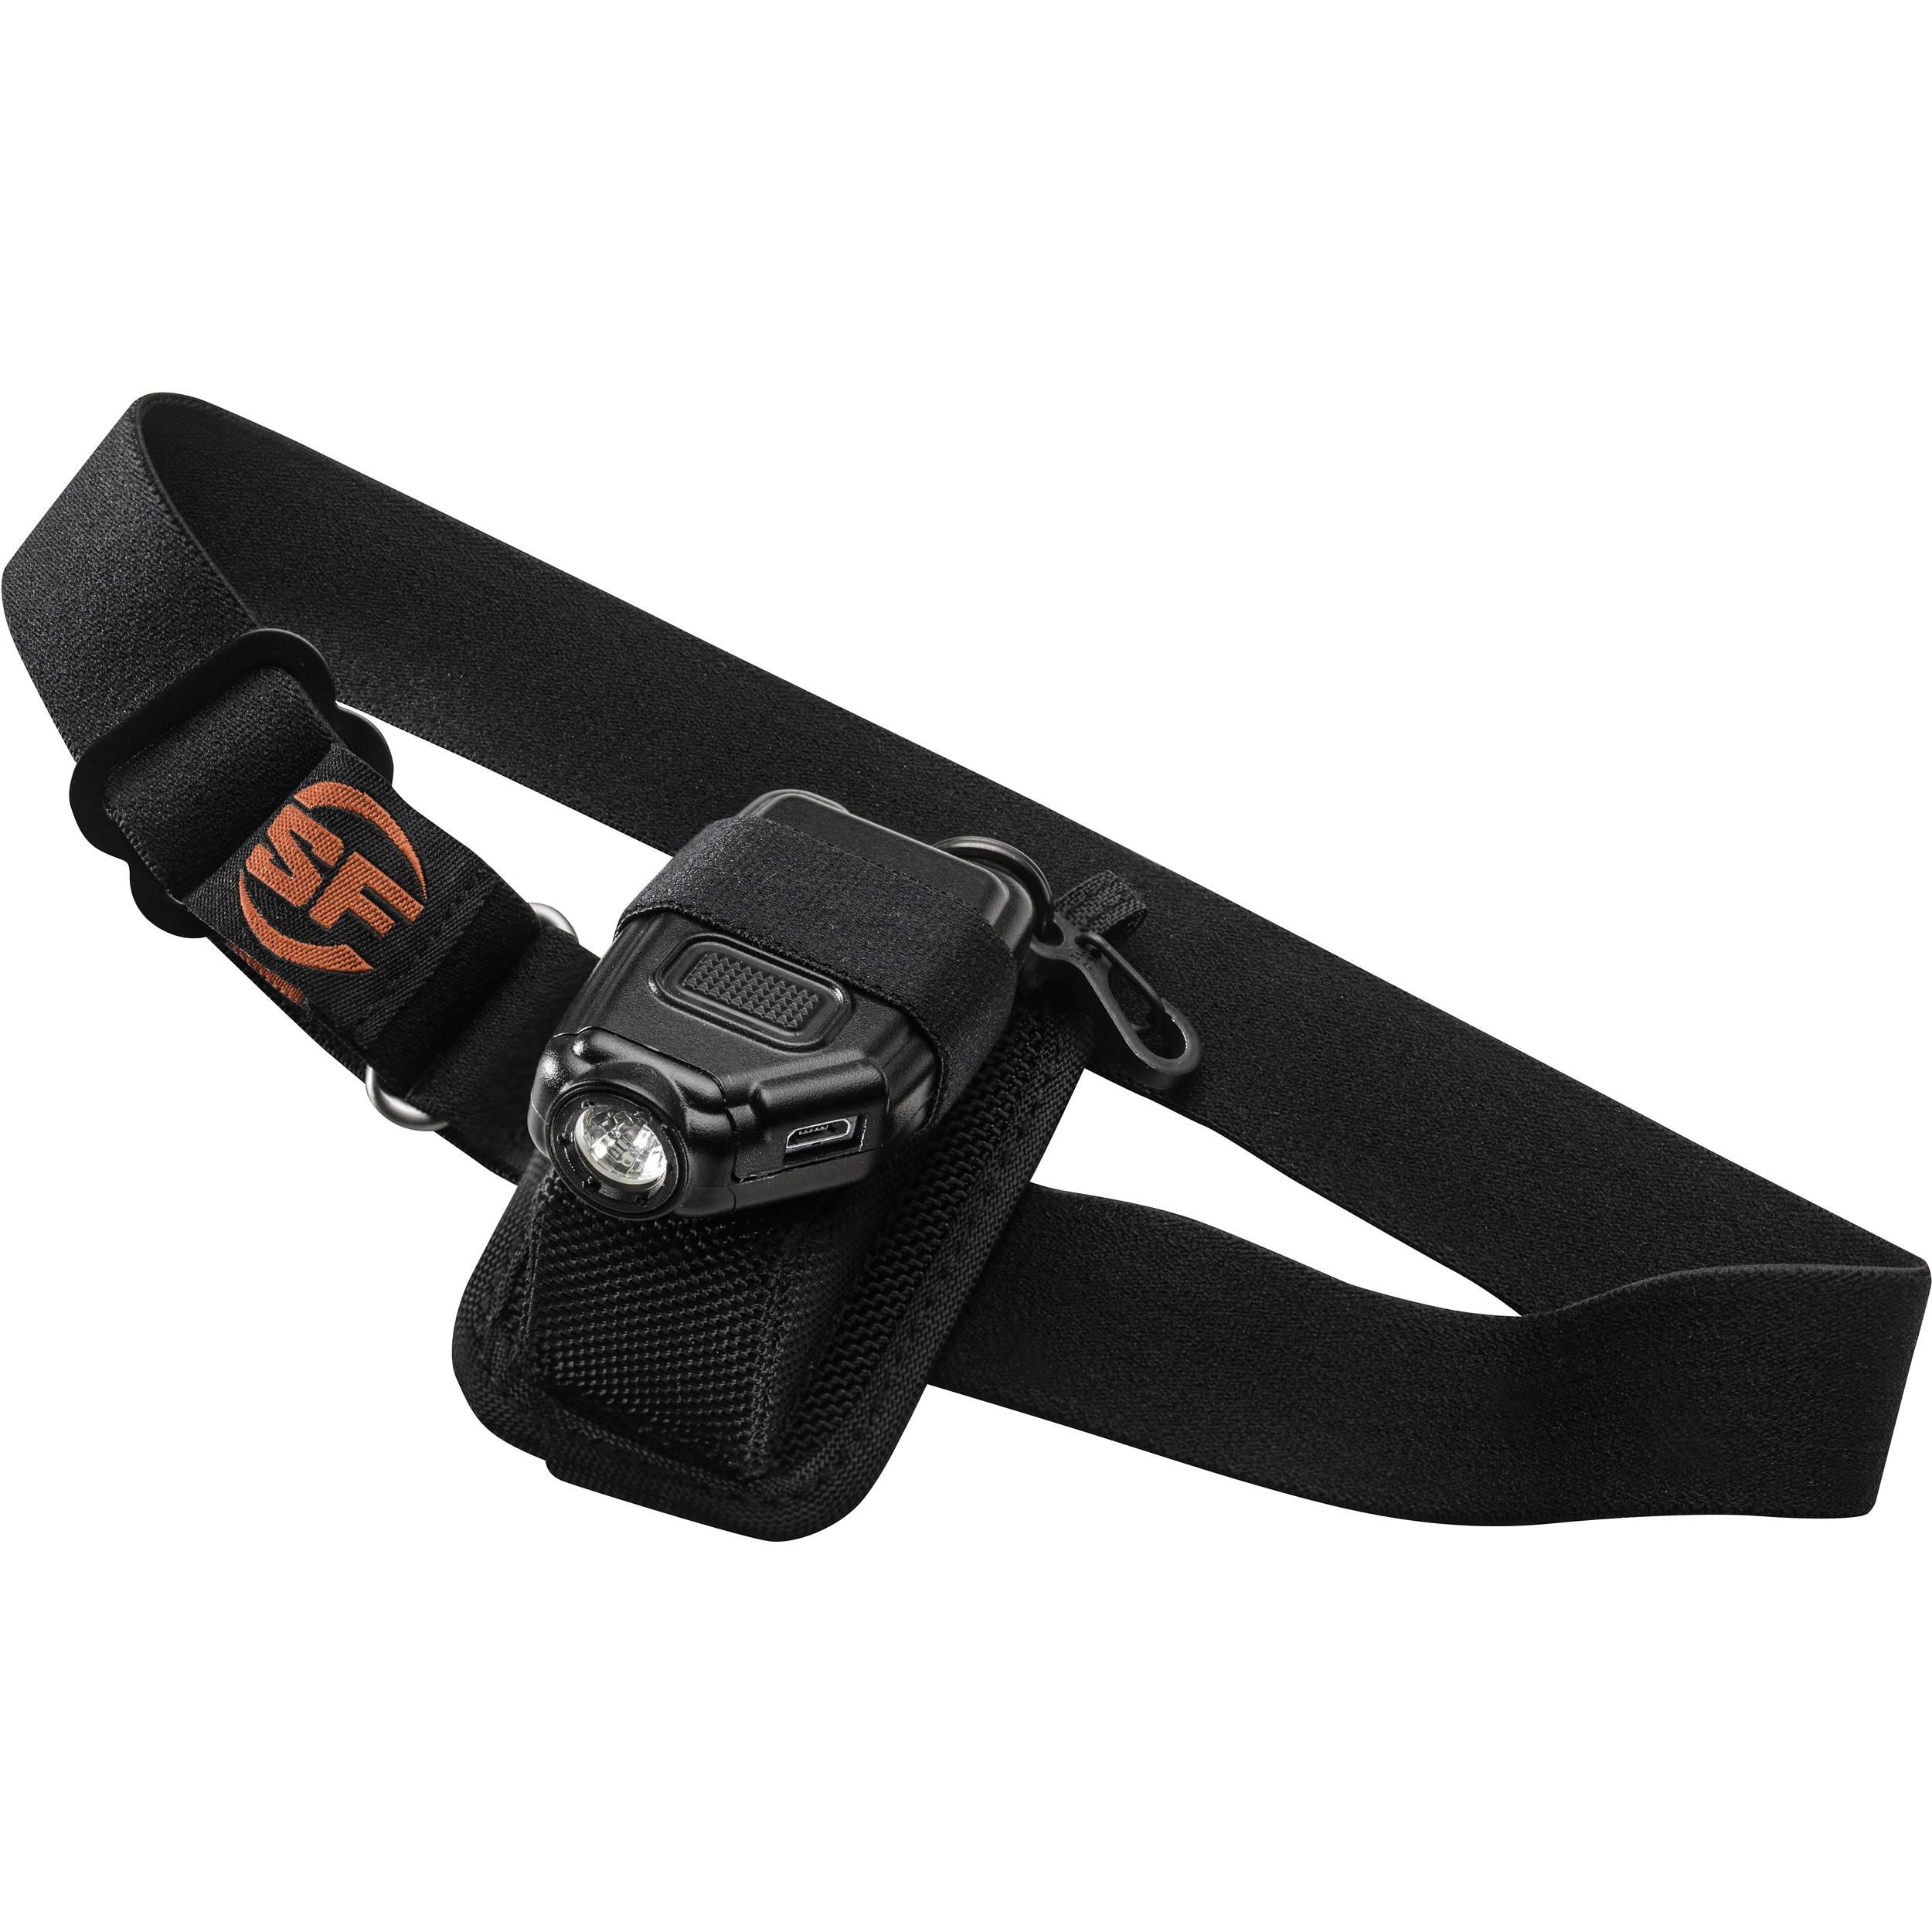 Elastic adjustable headband belt headlight lamp head strap for flashlight RS